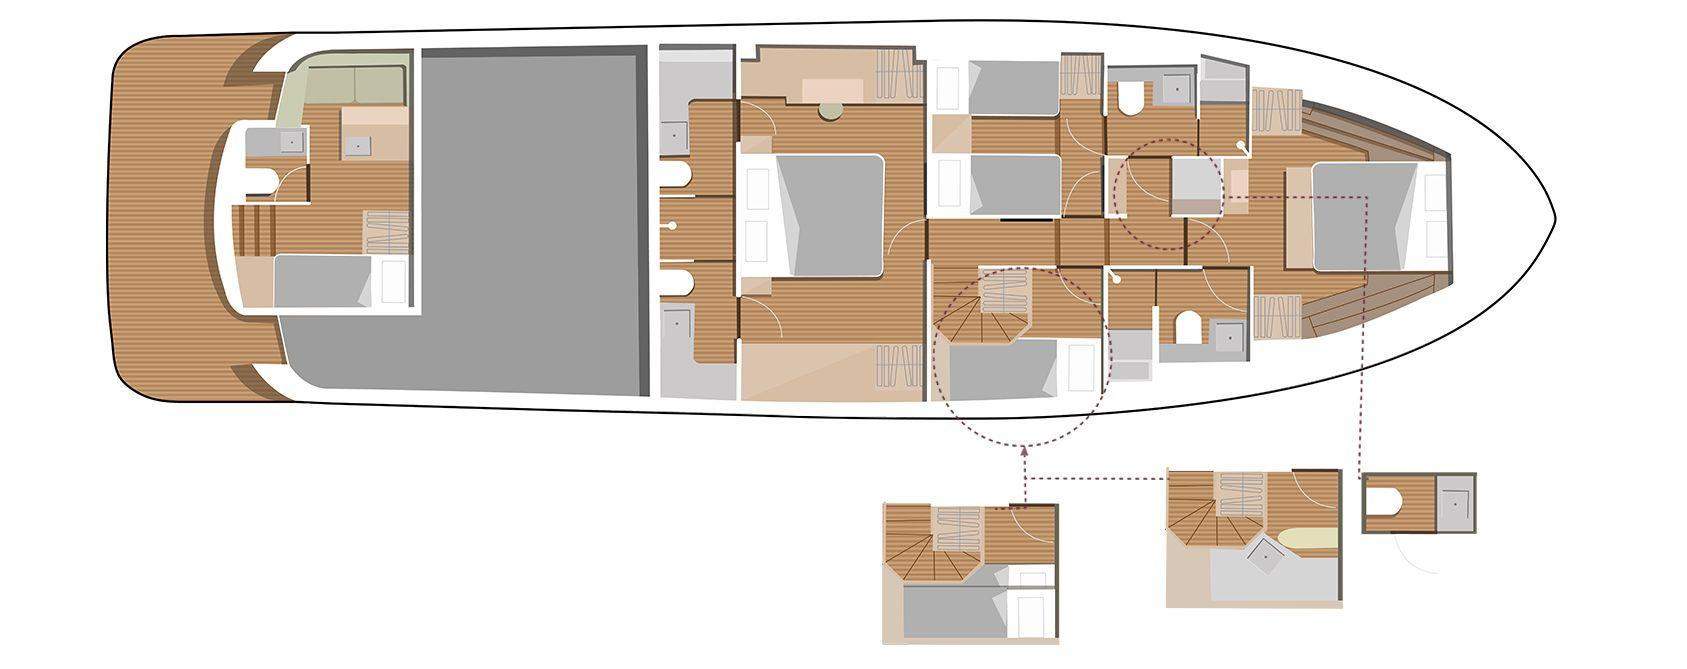 Sirena Yacht 68 layout